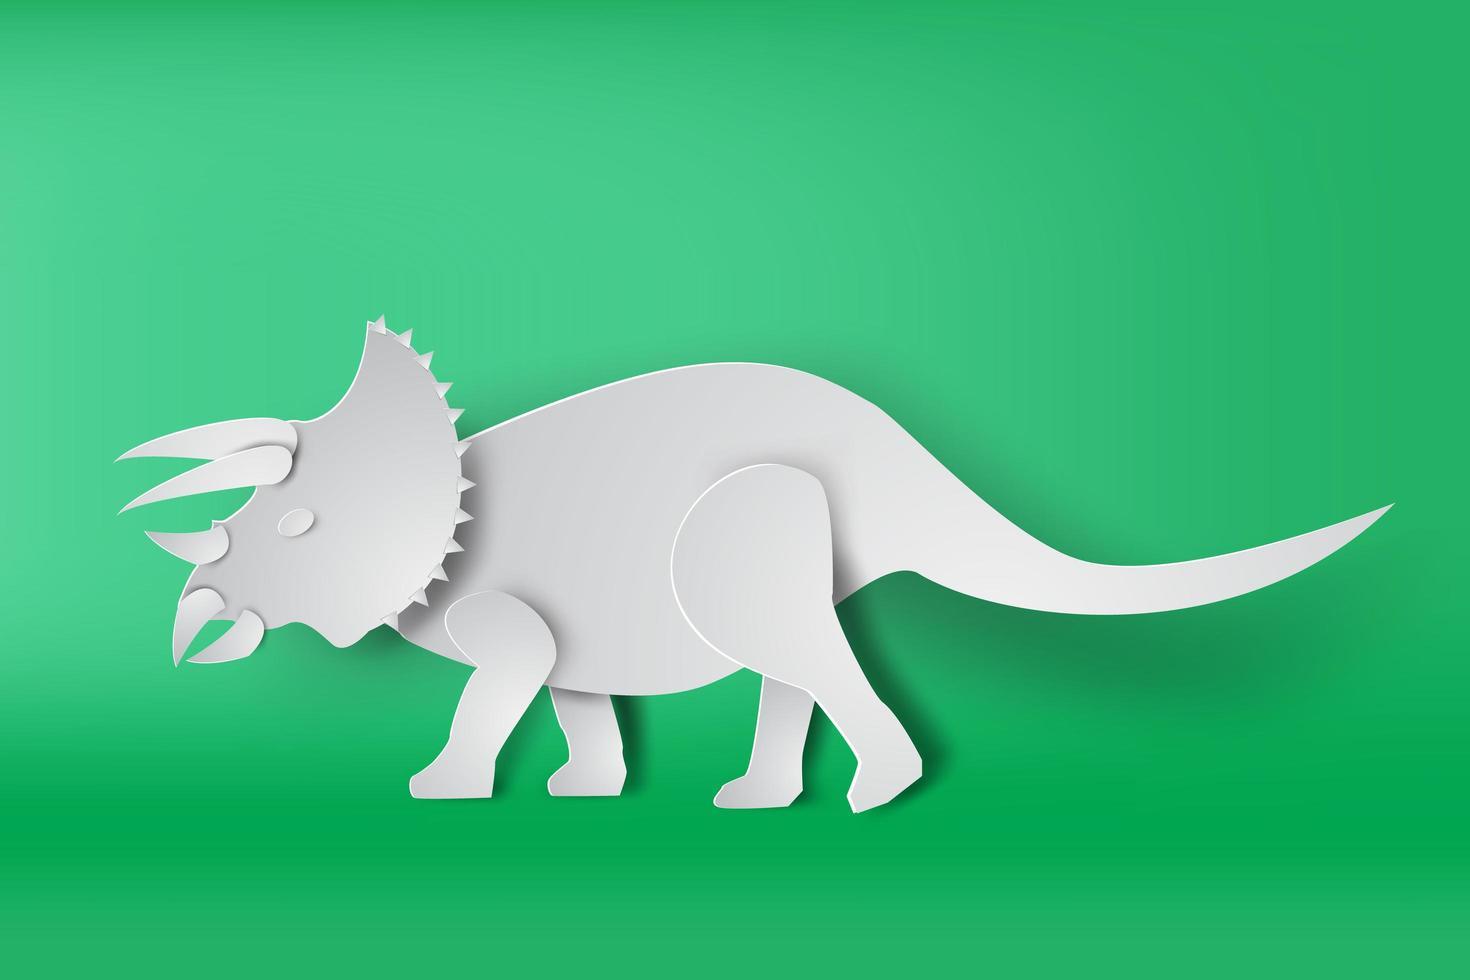 Papierkunst Triceratops Dinosaurier vektor